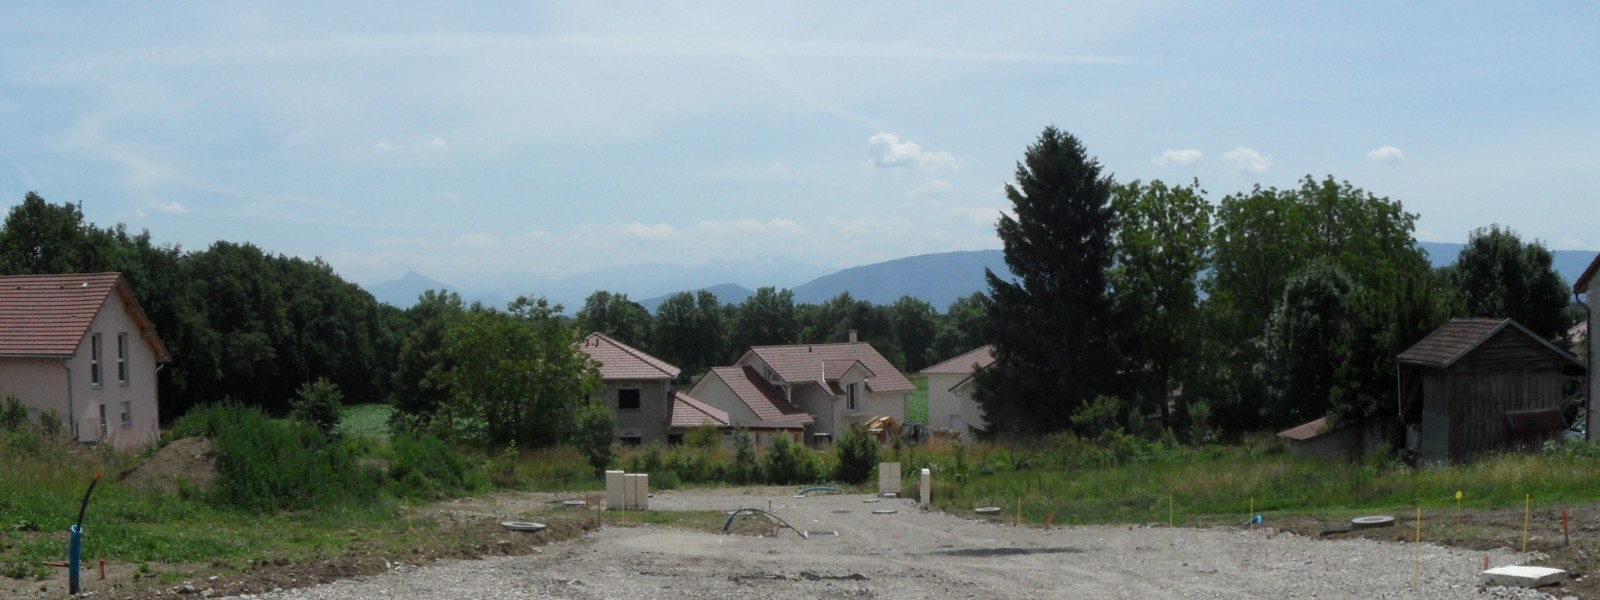 LES REINNETS - Visuel 2 - Impact immobilier 01